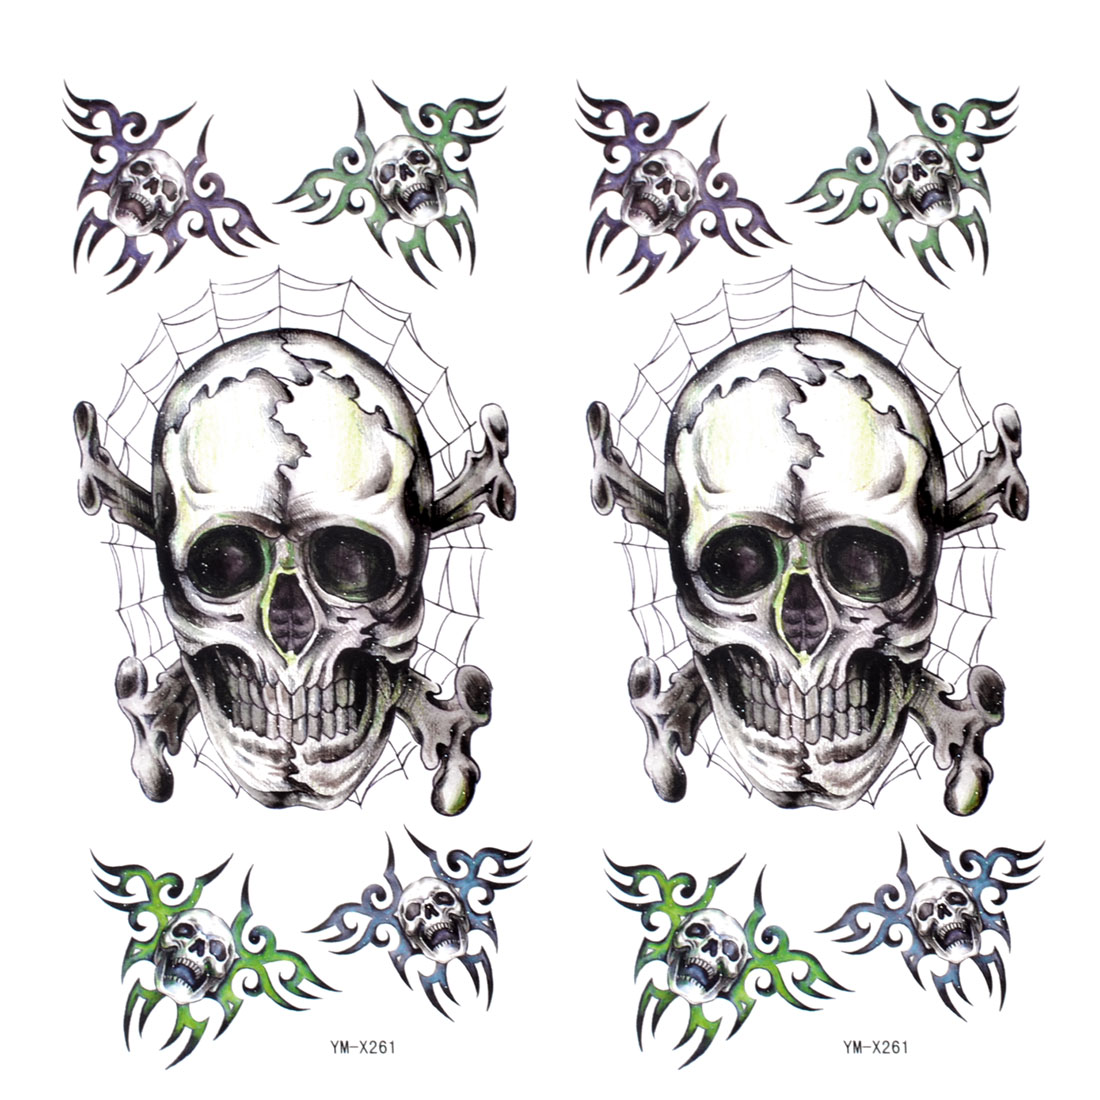 2 Pcs Dark Gray Skull Pattern Transfer Tribal Tattoos Skin Tattooing Decals